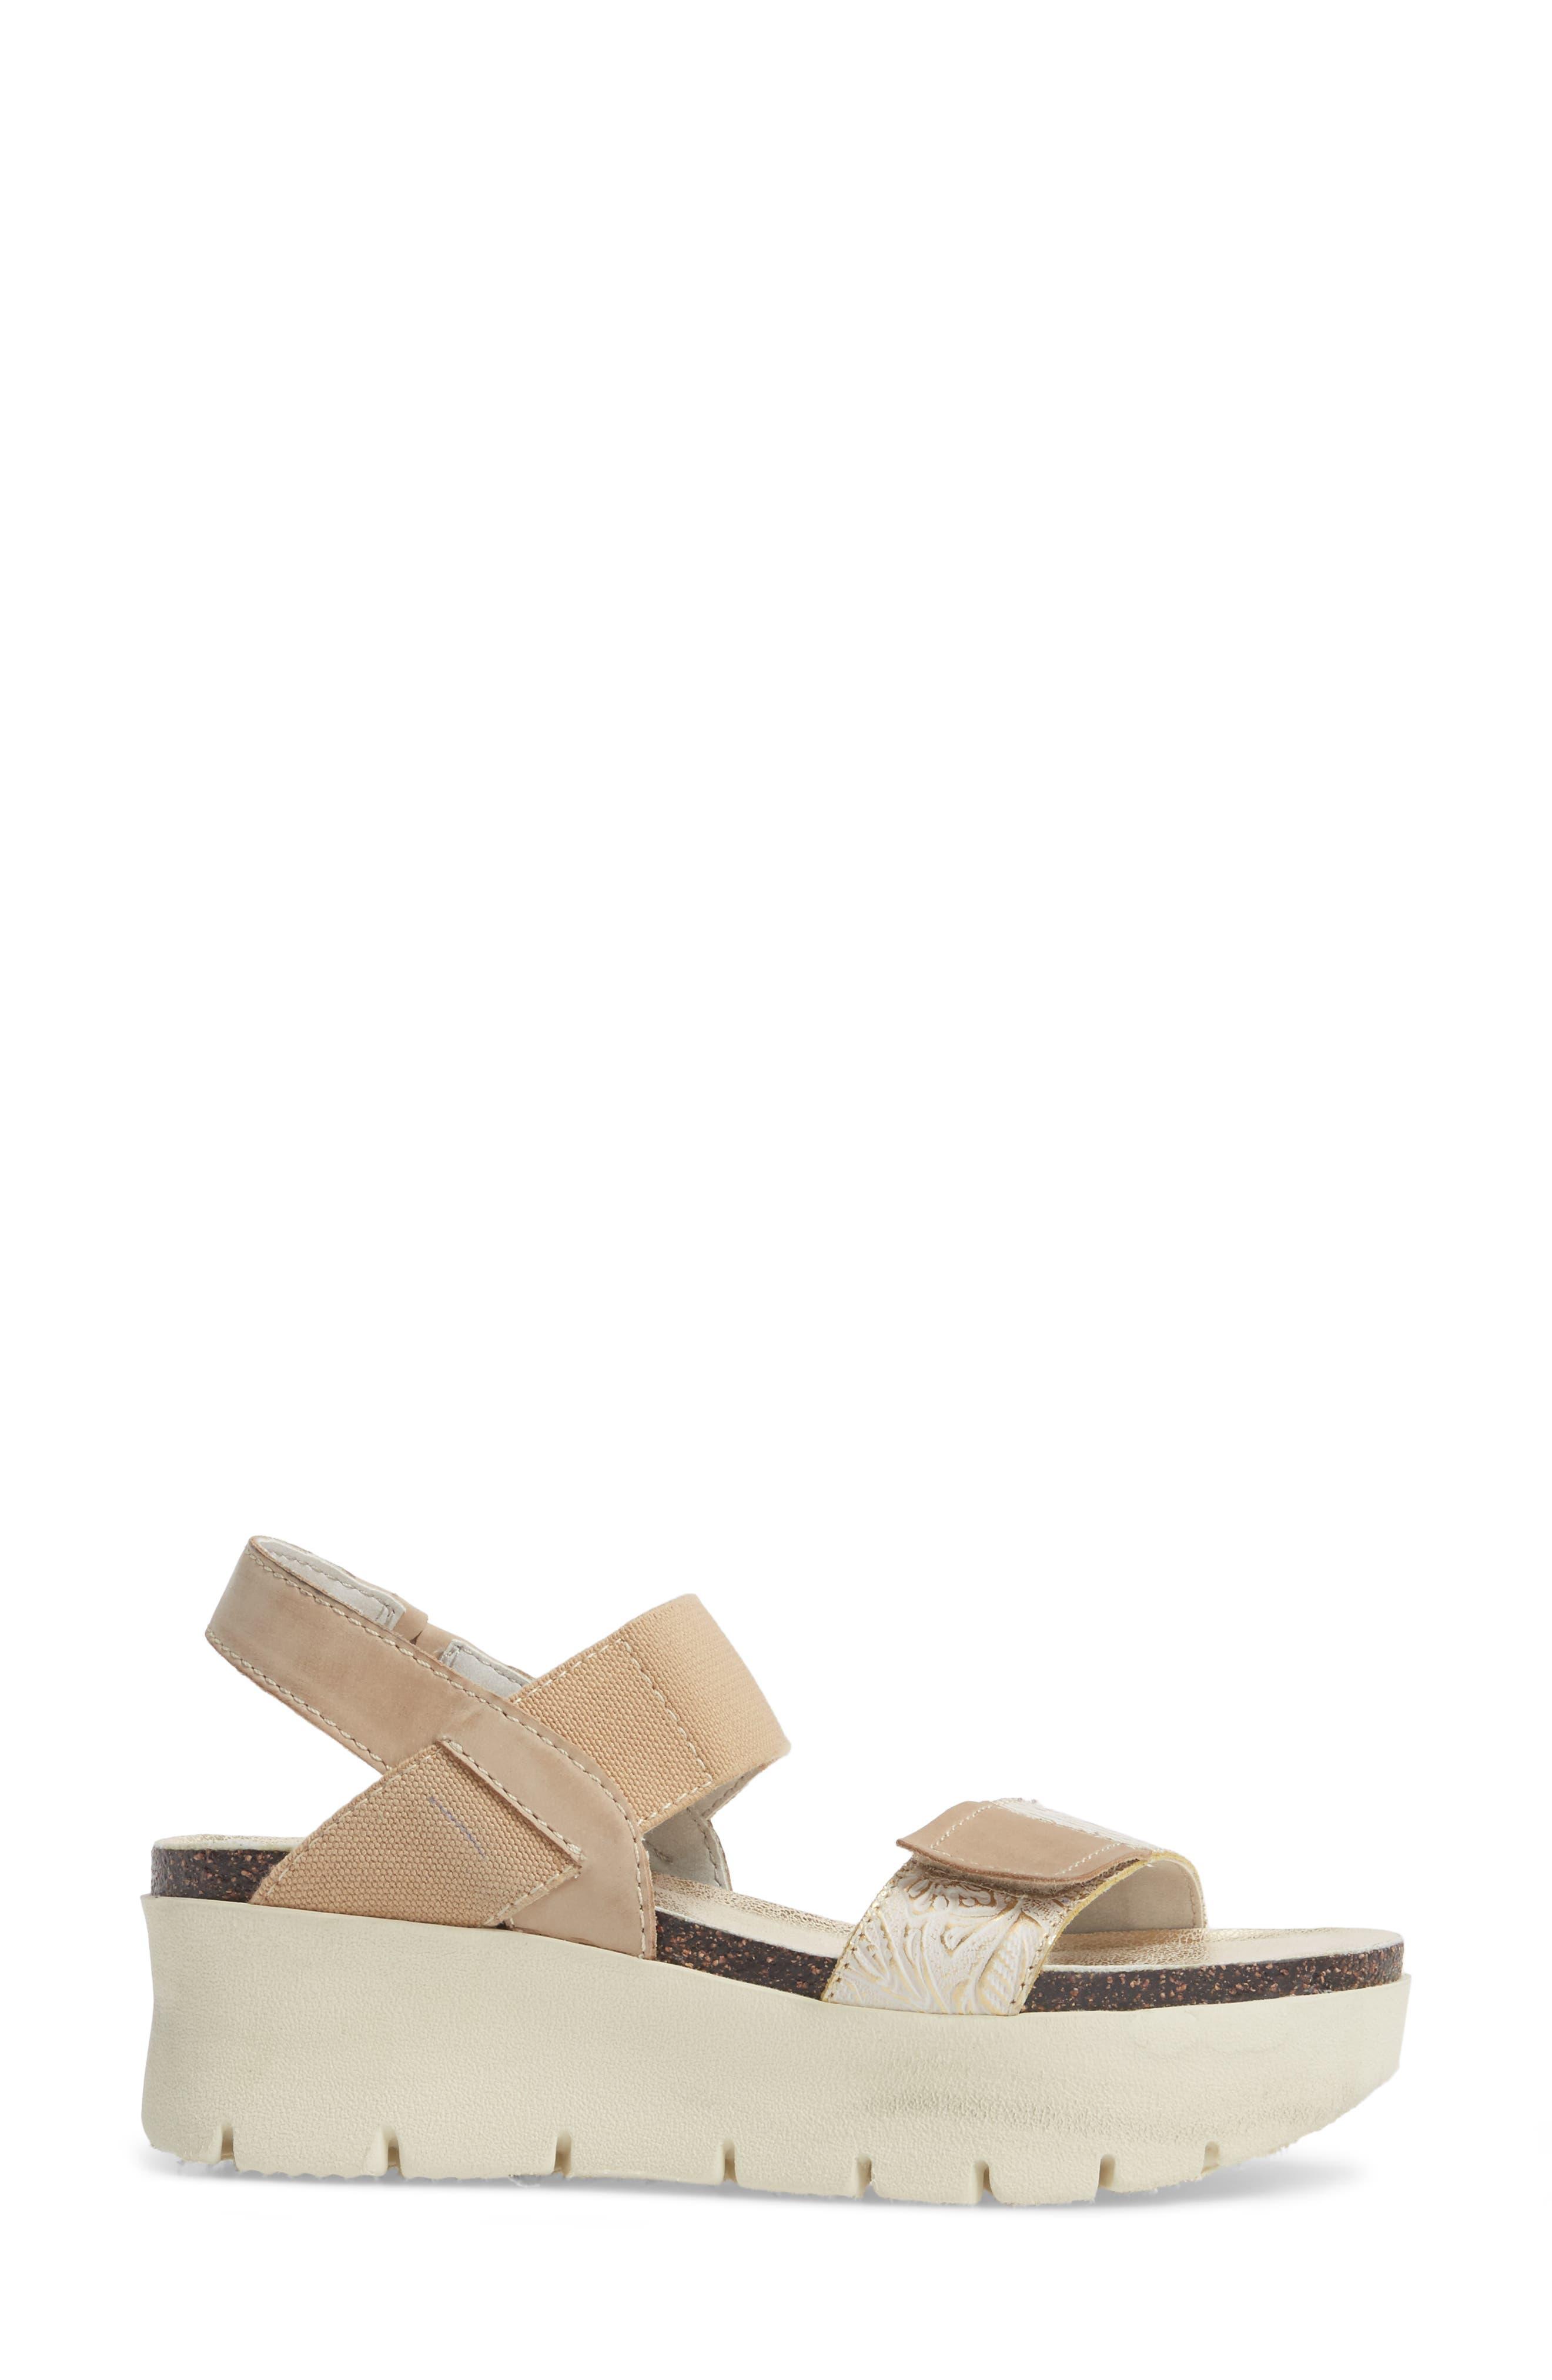 Alternate Image 3  - OTBT Nova Platform Sandal (Women)